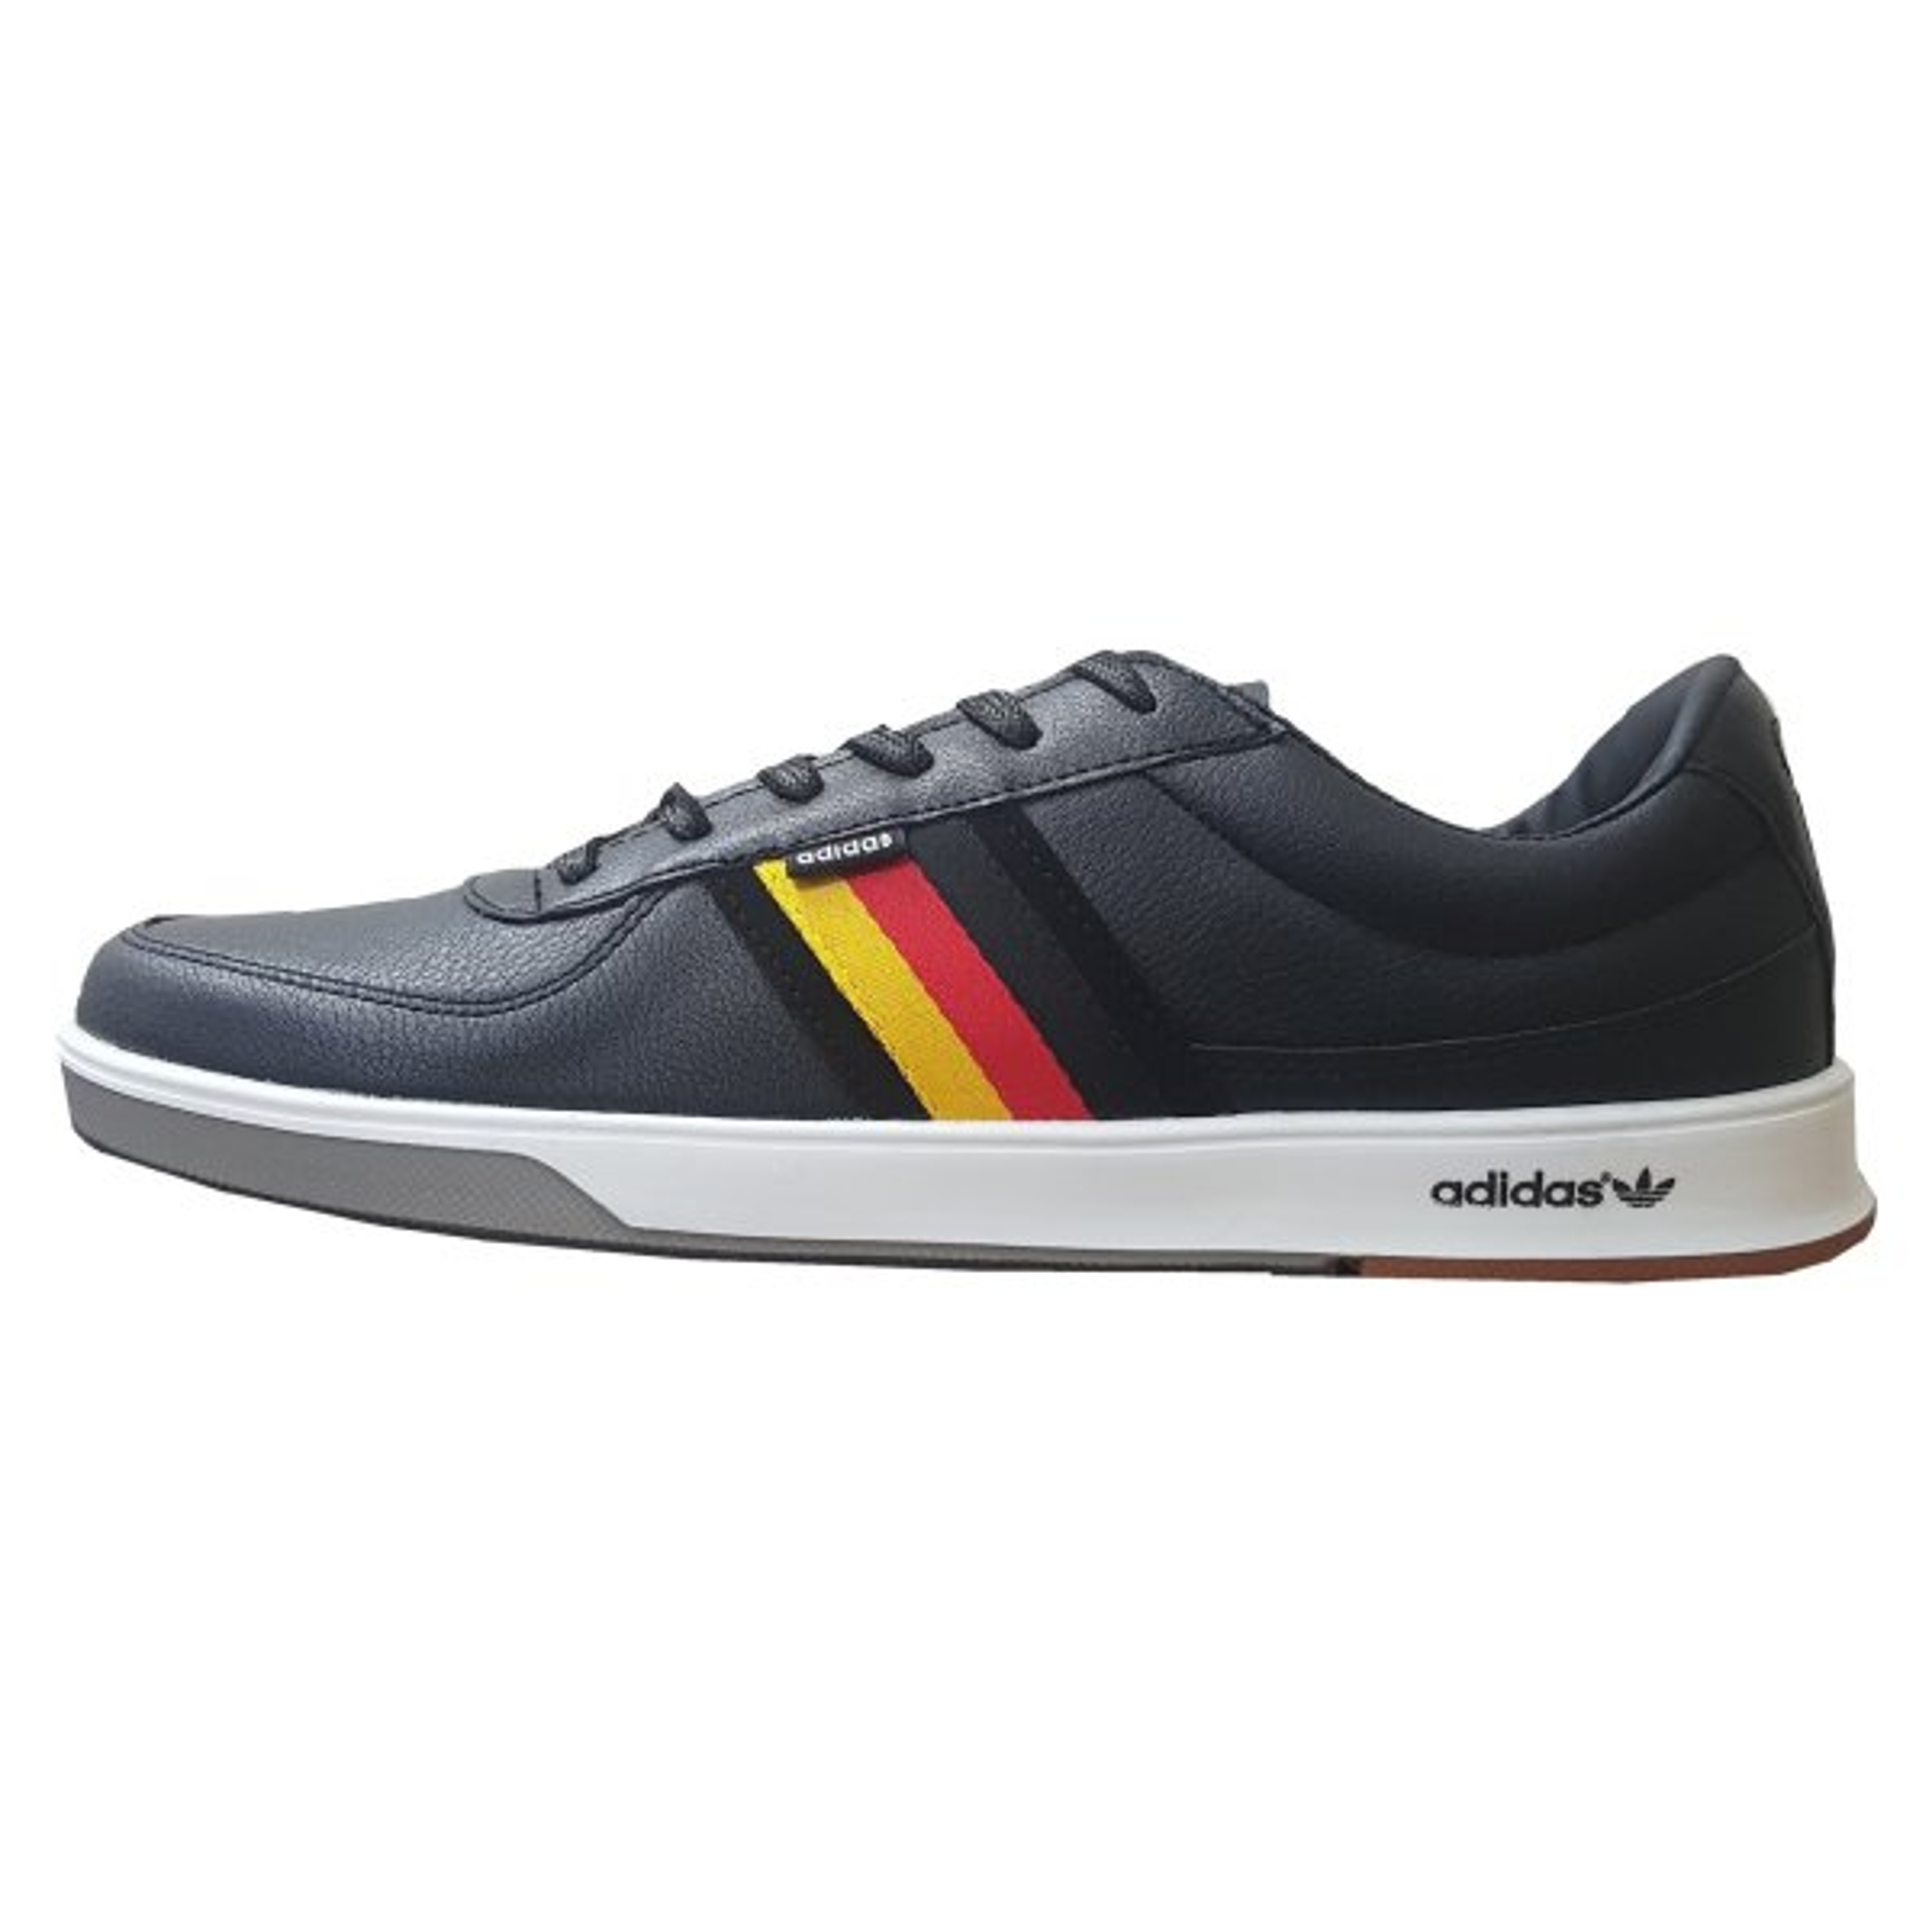 کفش روزمره مردانه مدل زامورا کد 5106